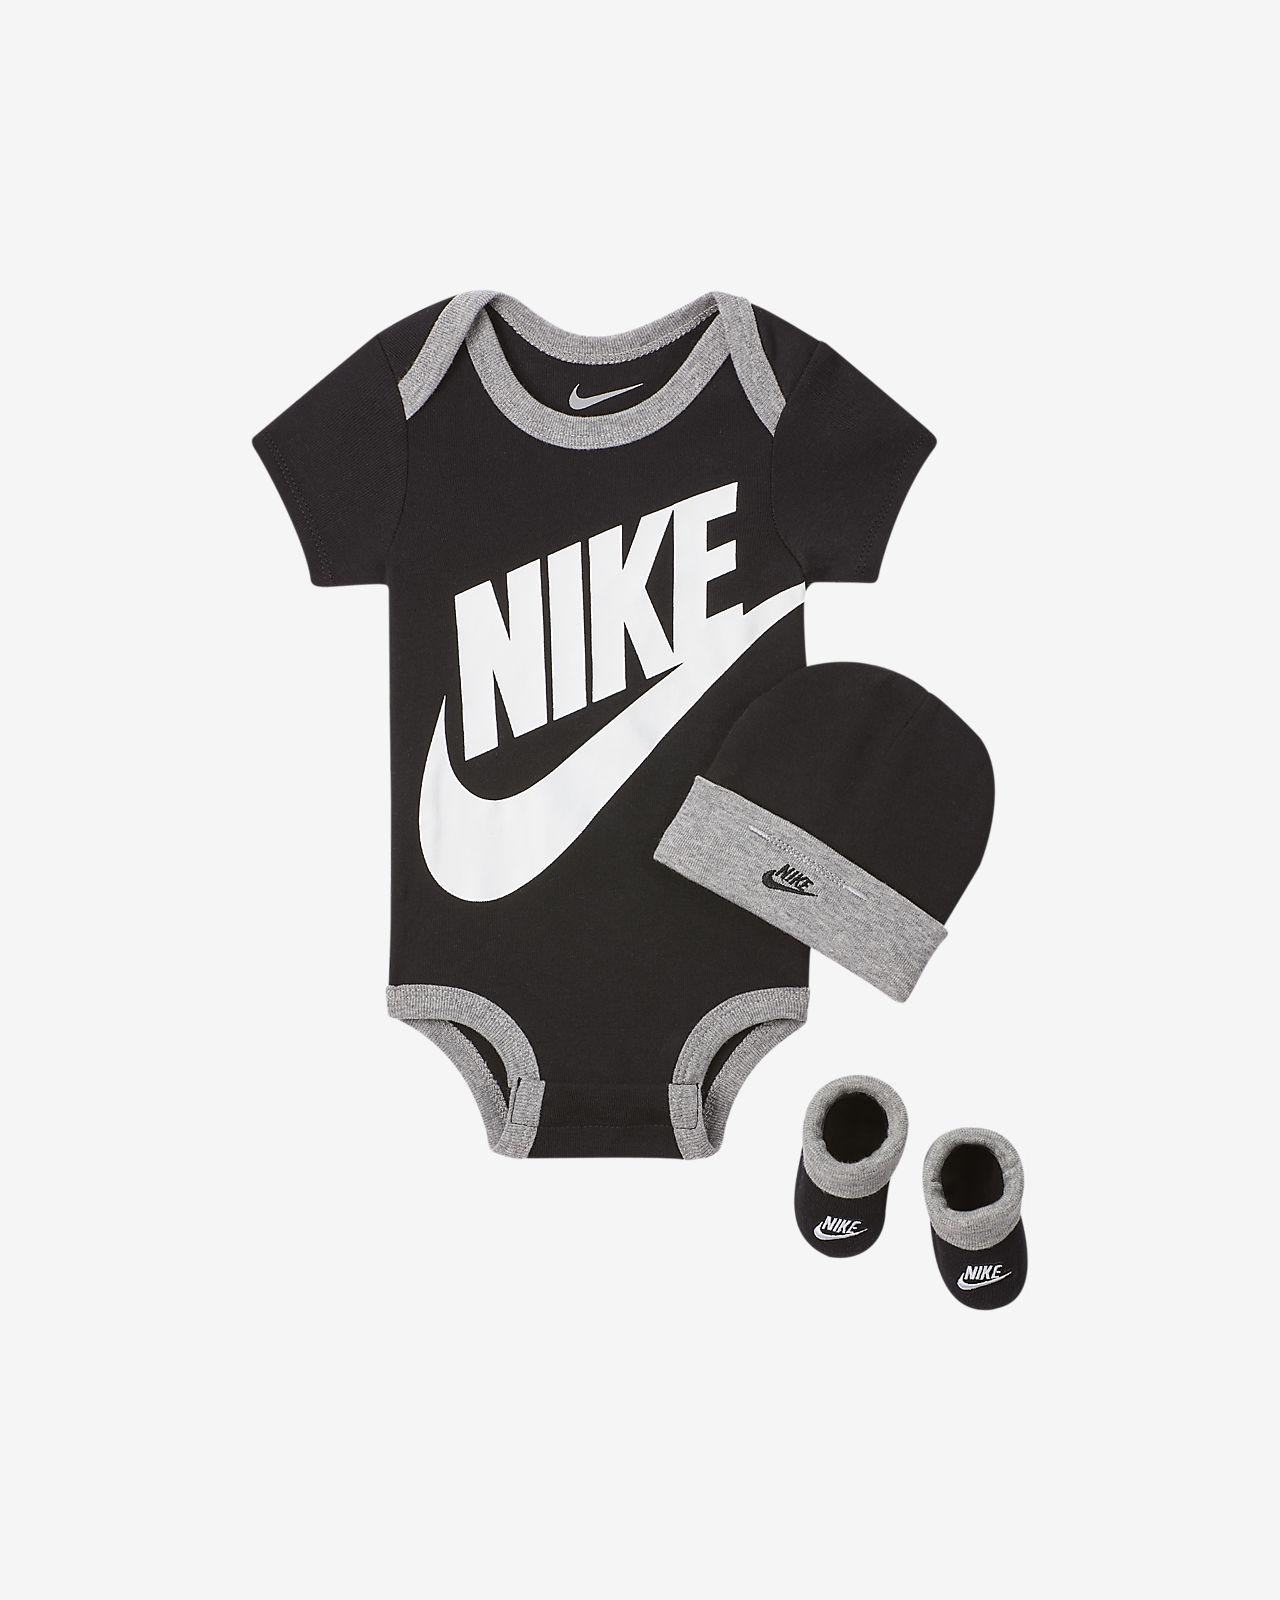 Conjunto de body, gorro y calzado para bebés (0 a 6 meses) Nike